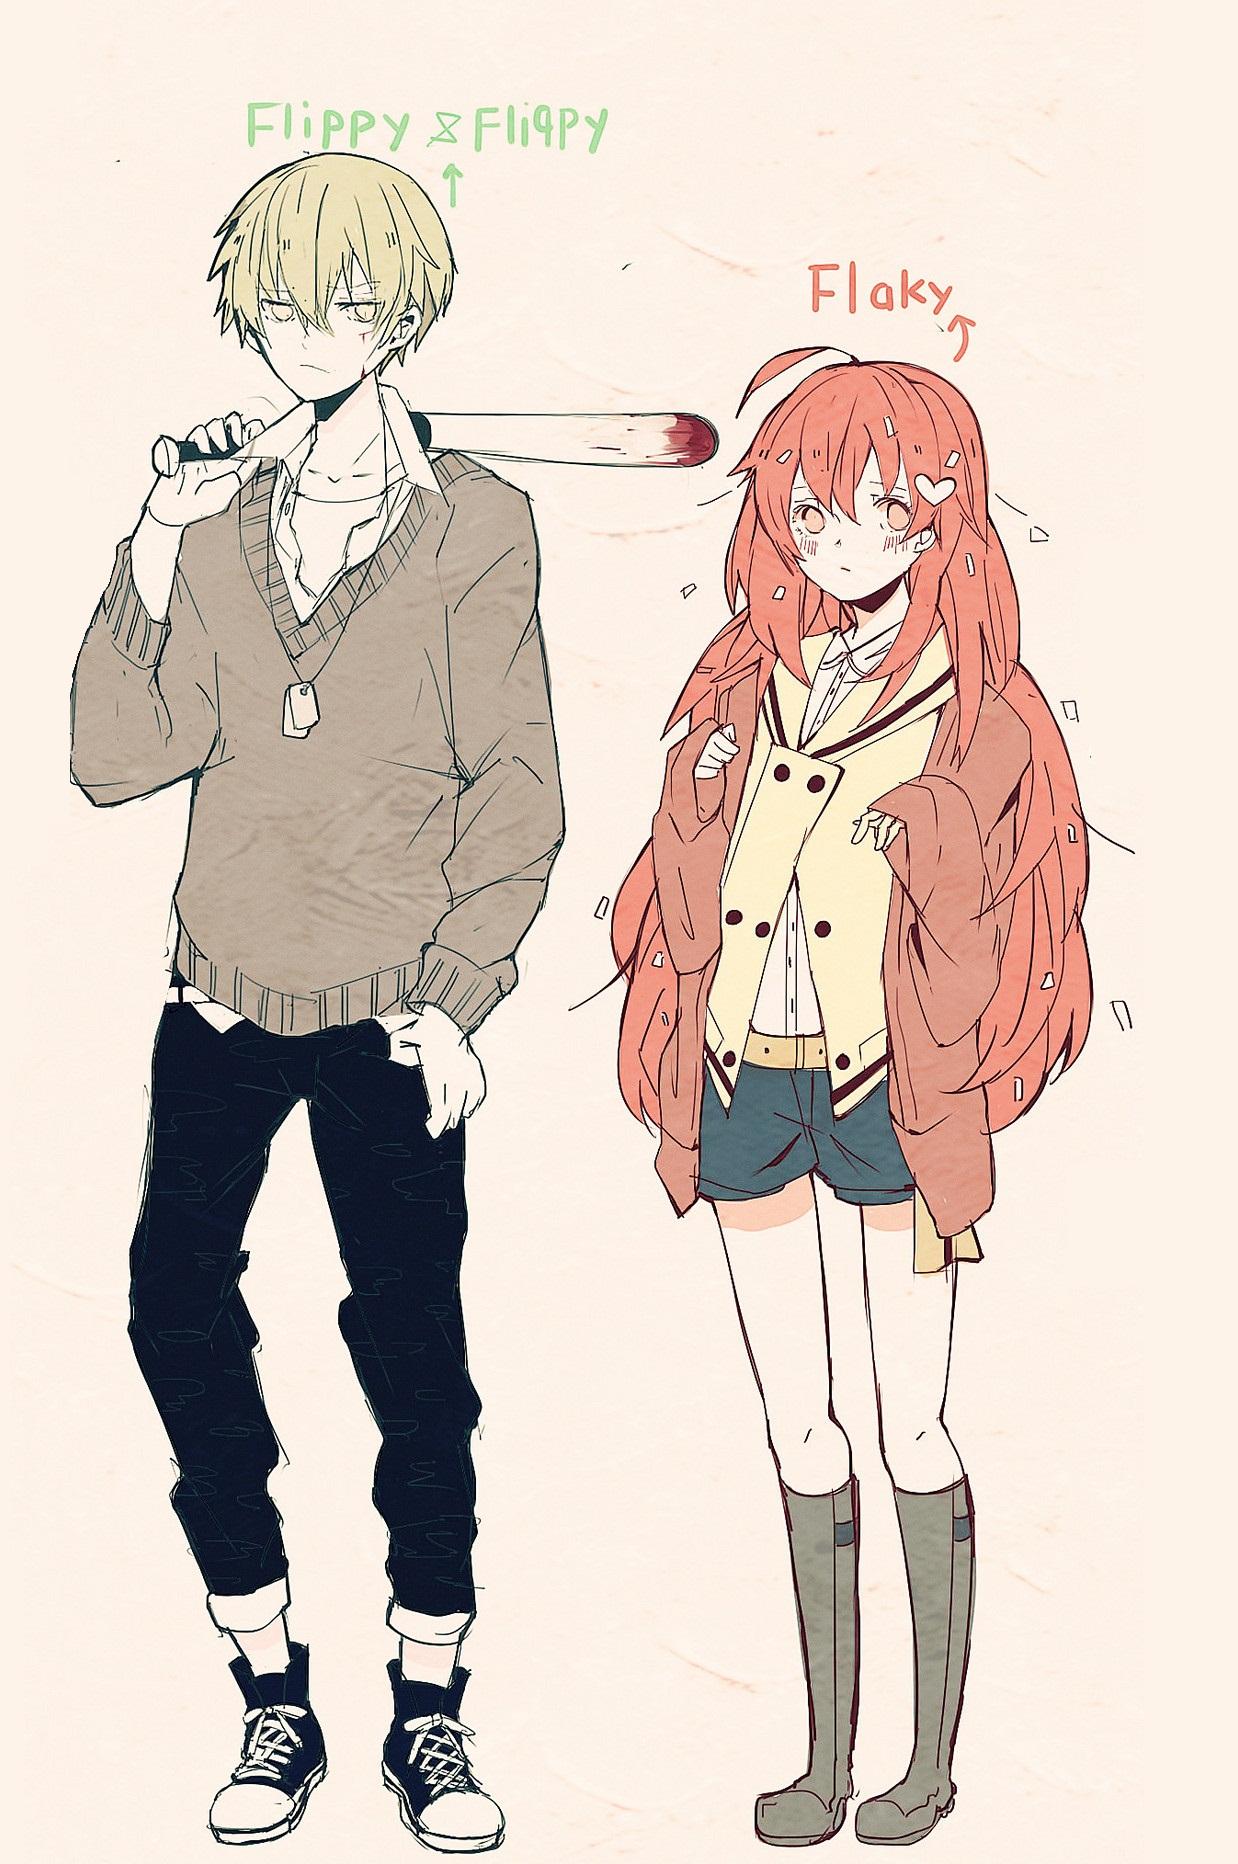 Flippy and Flaky highschool anime - Flippy x Flaky Photo ...